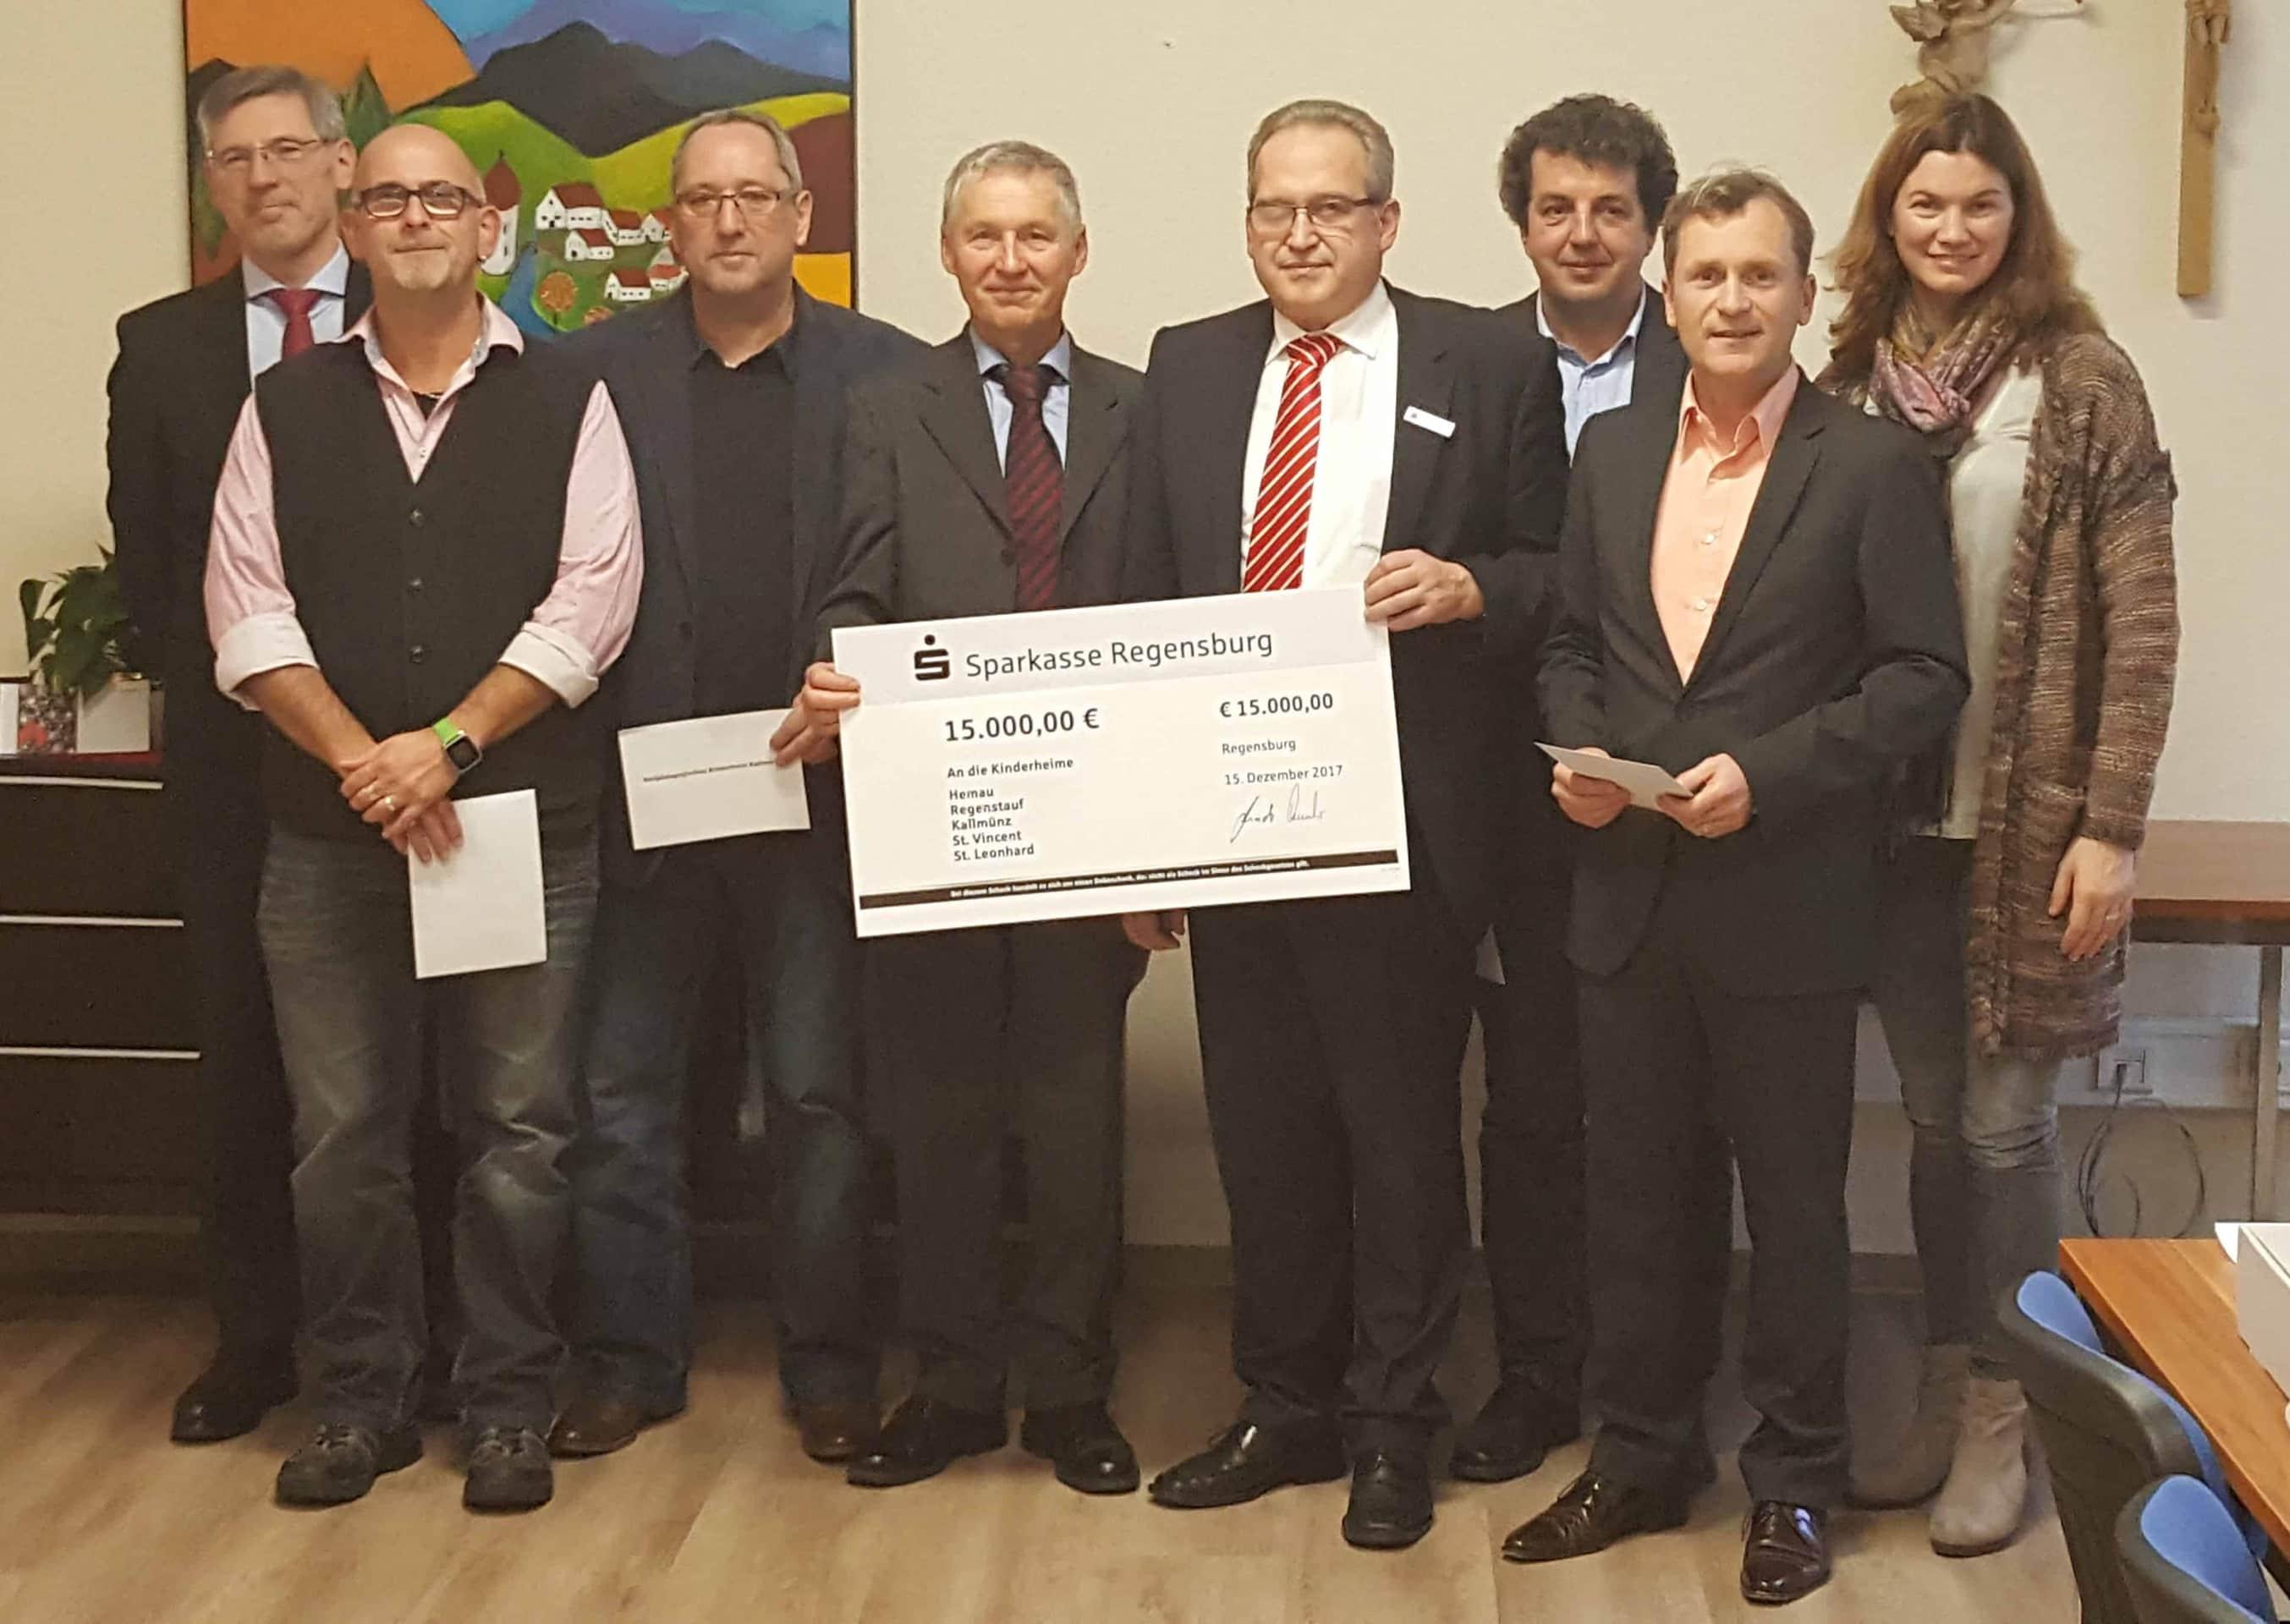 Sparkasse Regensburg: Großzügige Spende an Kinderheime